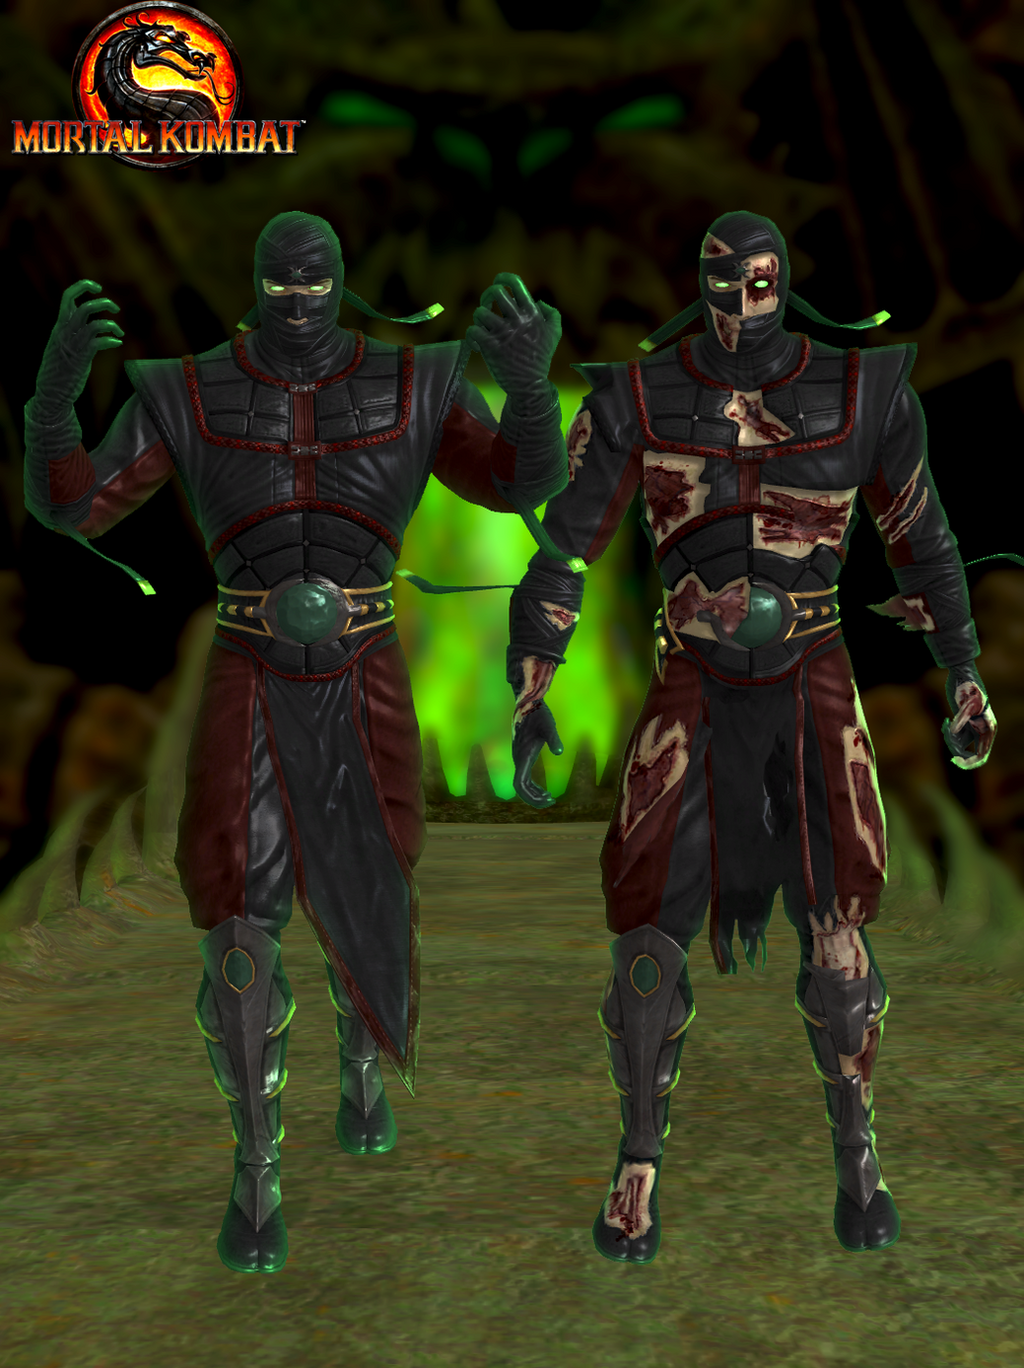 ... Ermac - Mortal Kombat 9 by romero1718